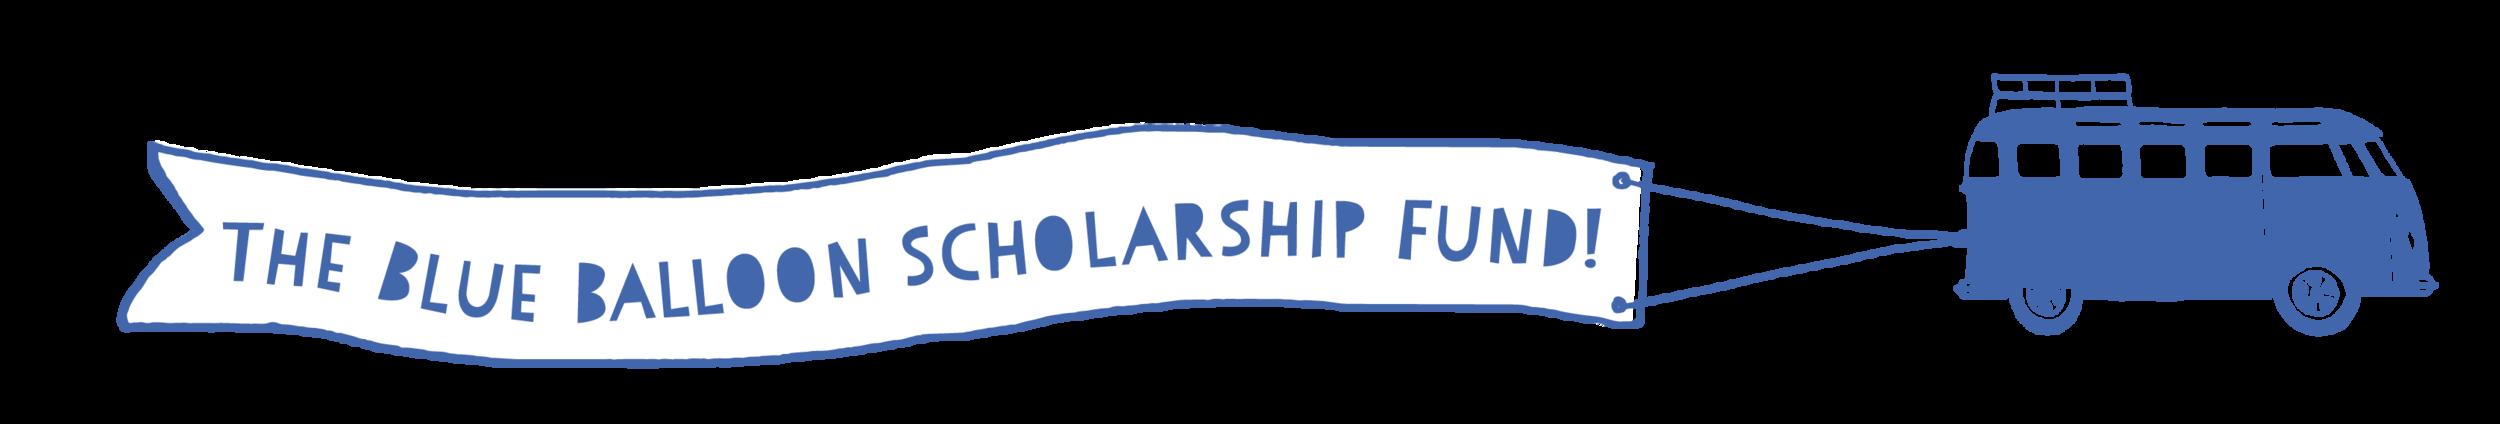 The Blue Balloon scholarship fund